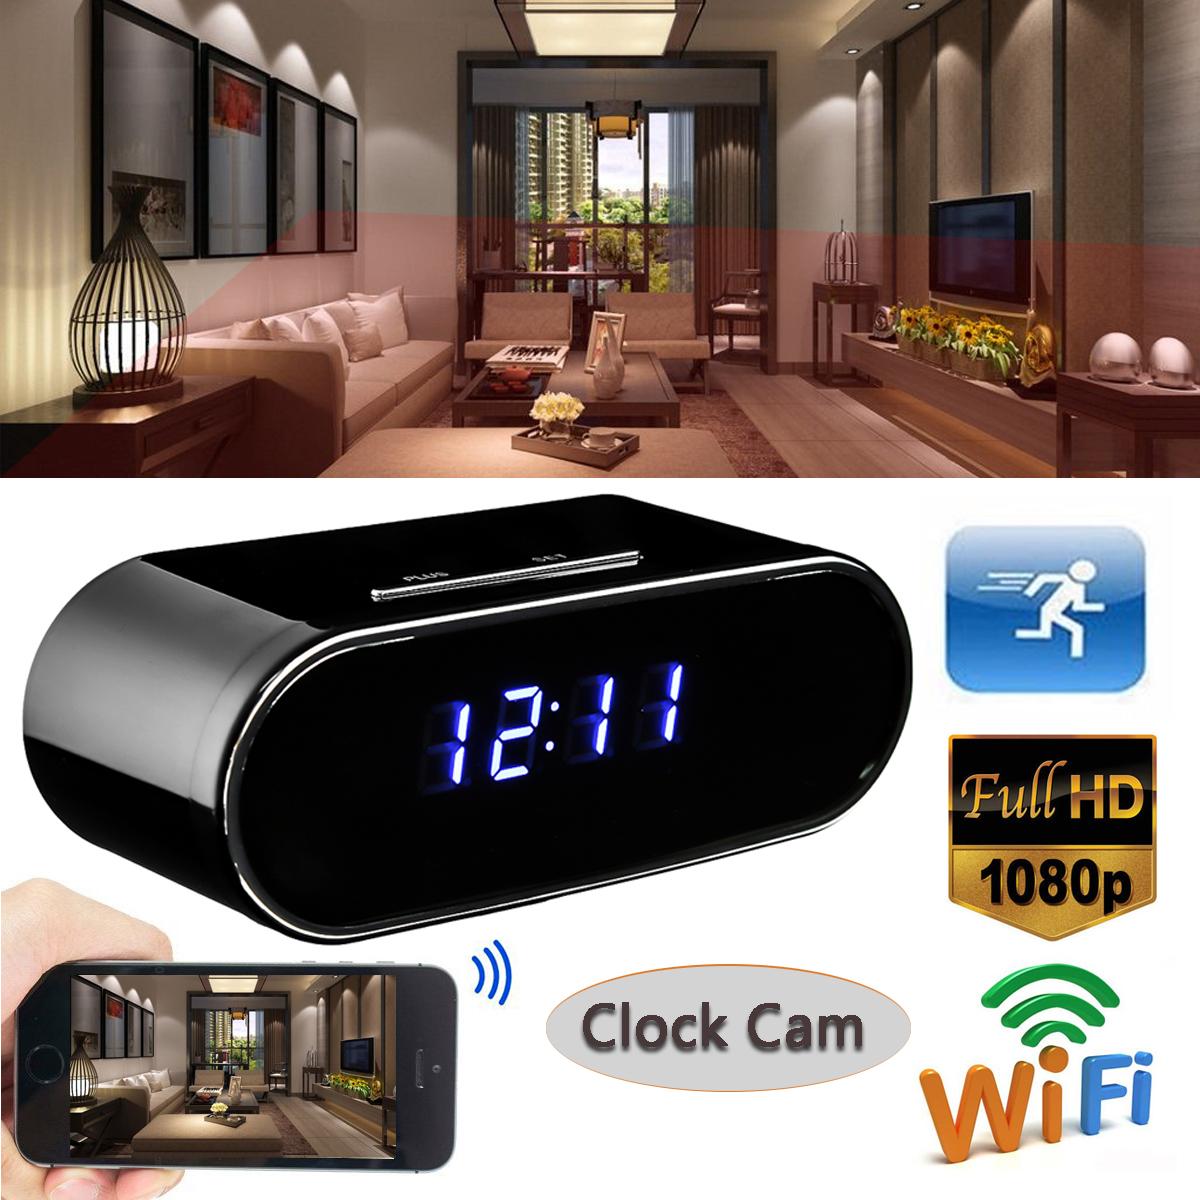 HD 1080P WiFi Wireless Hidden Camera Alarm Clock Video Recorder Motion Security Detection Realtime Covert Nanny Cam Home Surveillance DVR DV Camcorder Sound App Remote Monitoring